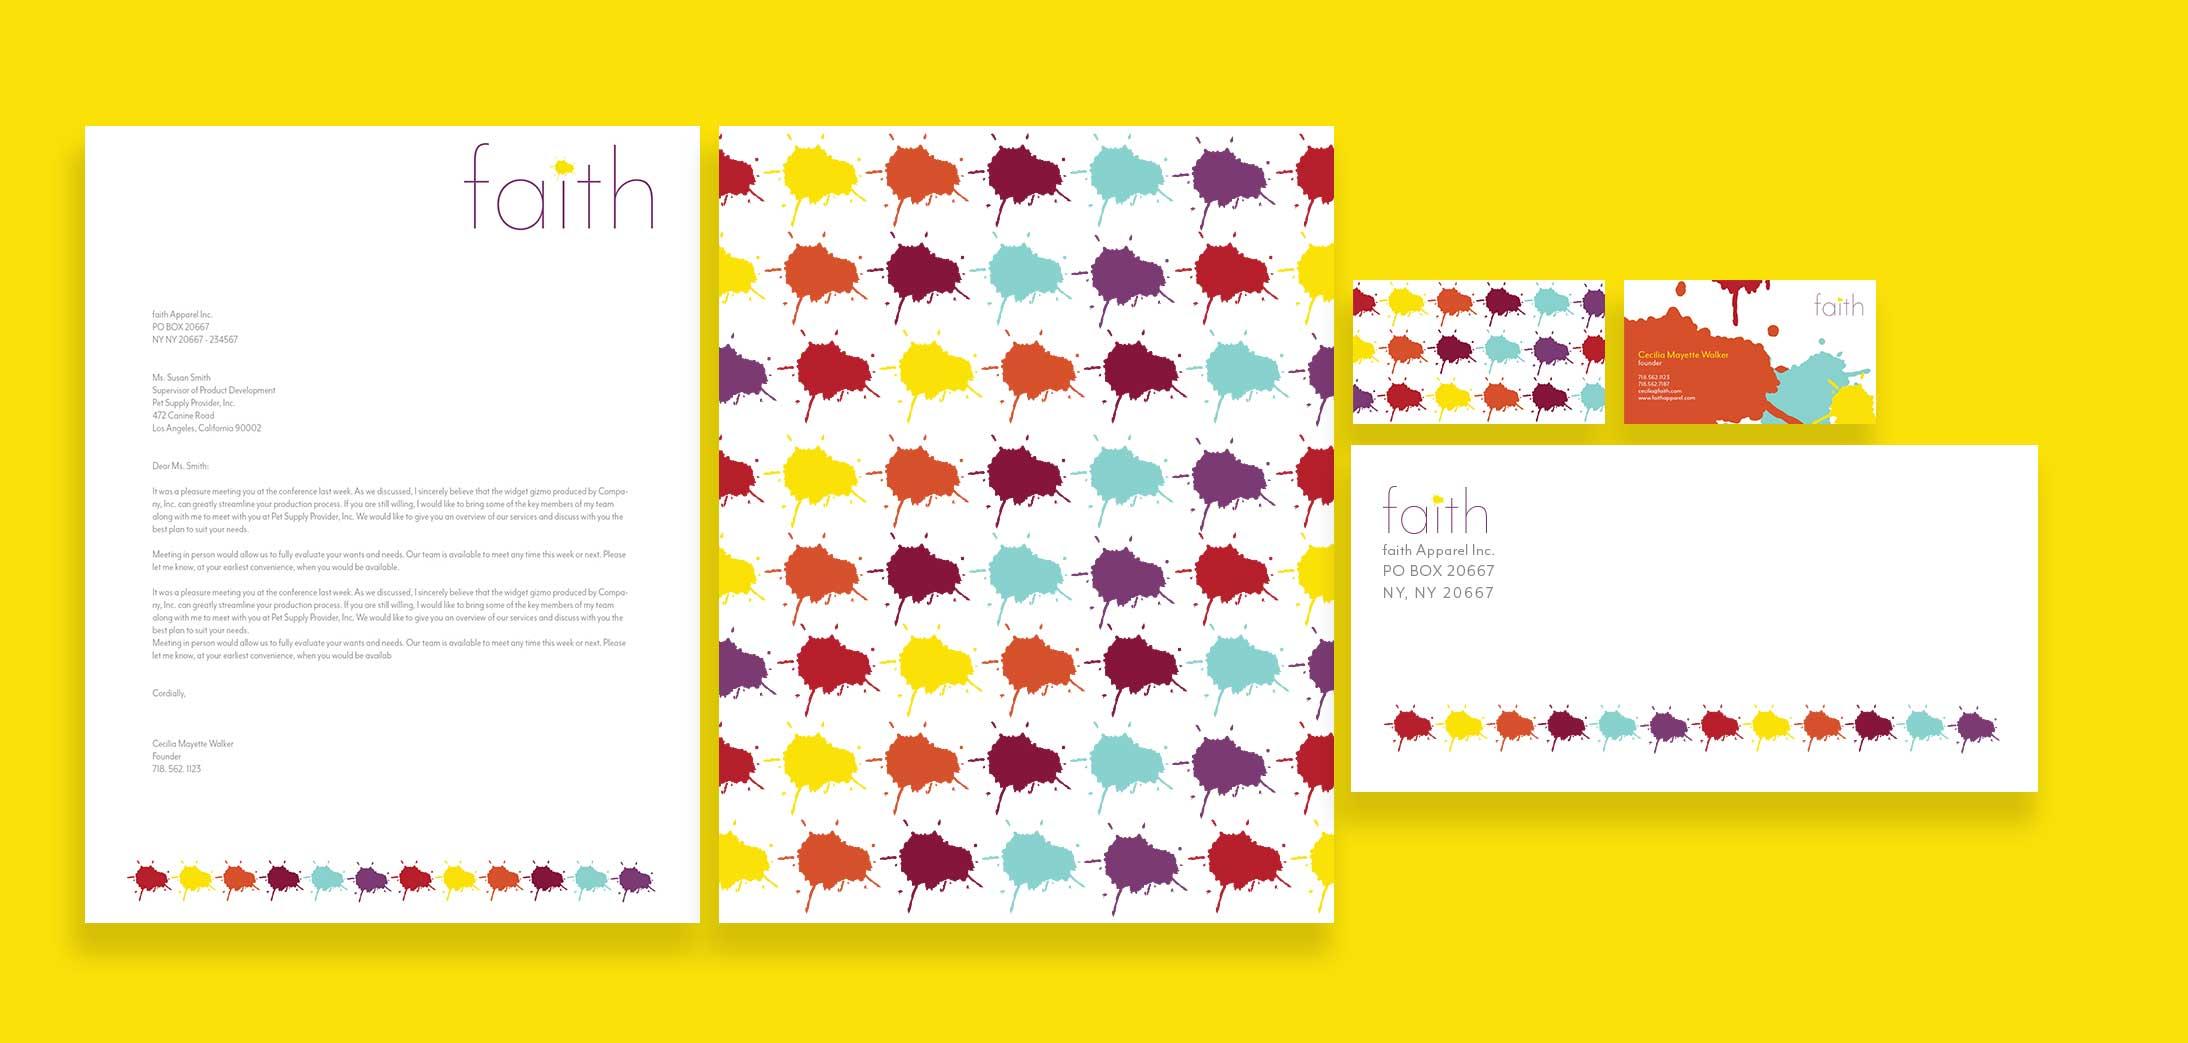 faith_brand_identity-v1.jpg